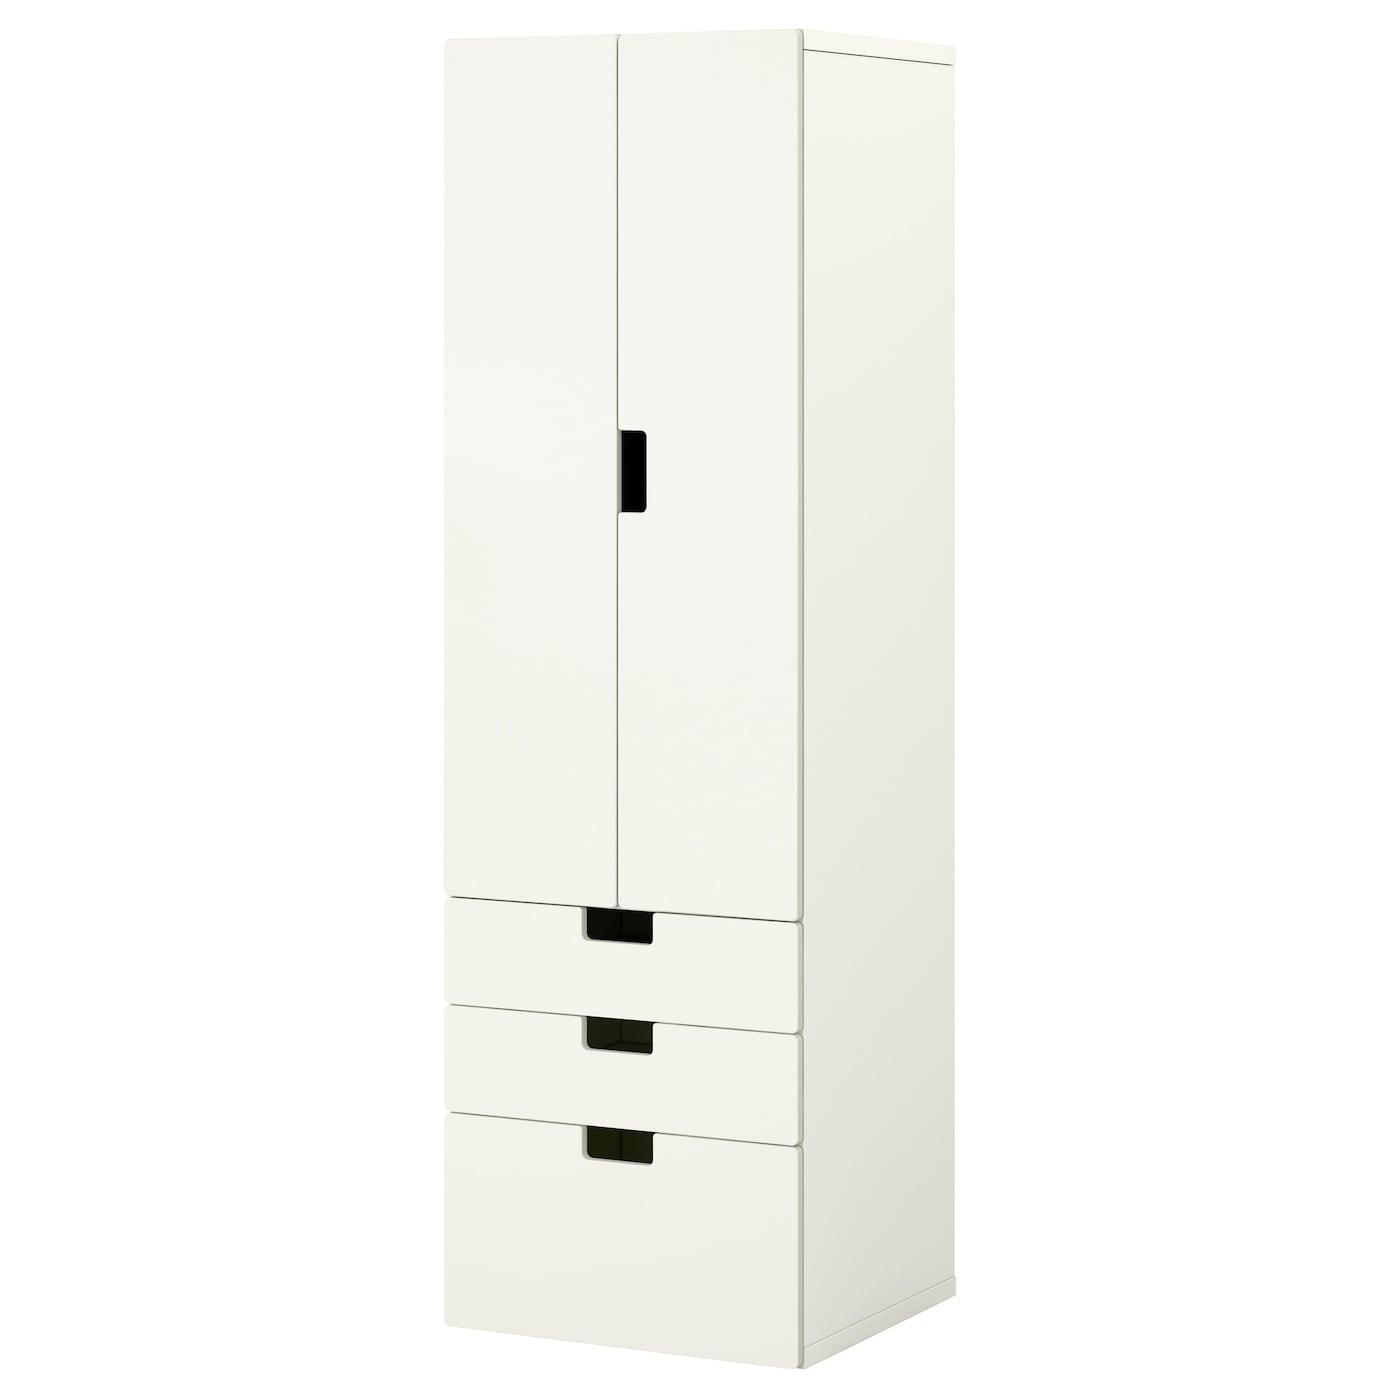 IKEA STUVA / STUVA MÅLAD Szafa, biały, biały, 60x50x192 cm